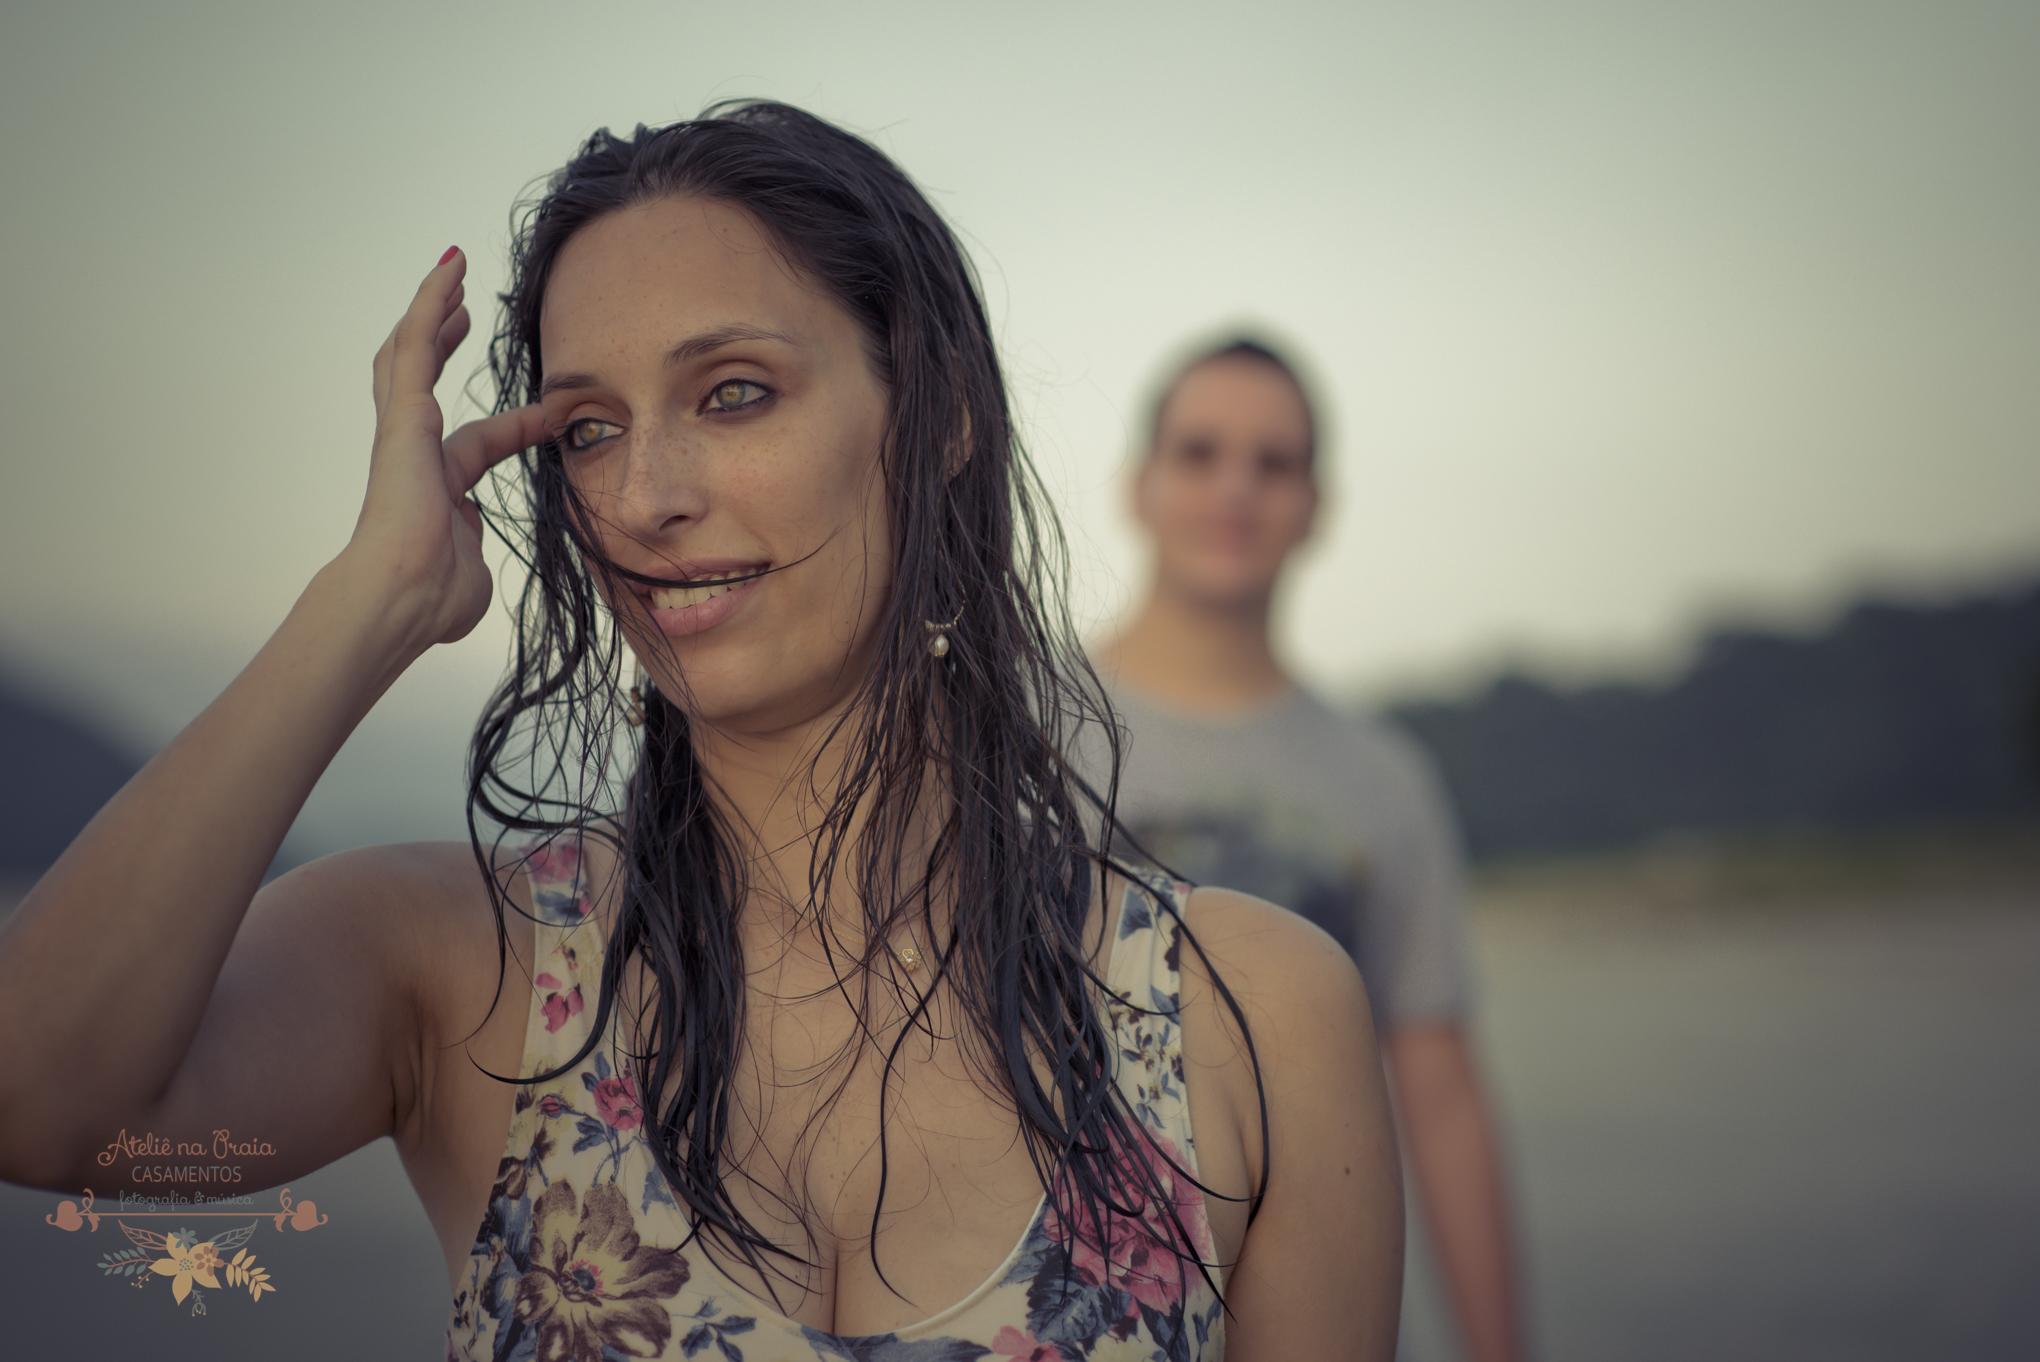 Atelie-na-Praia-Pre-Wedding-Thiesa-Bruno-PQ-2774